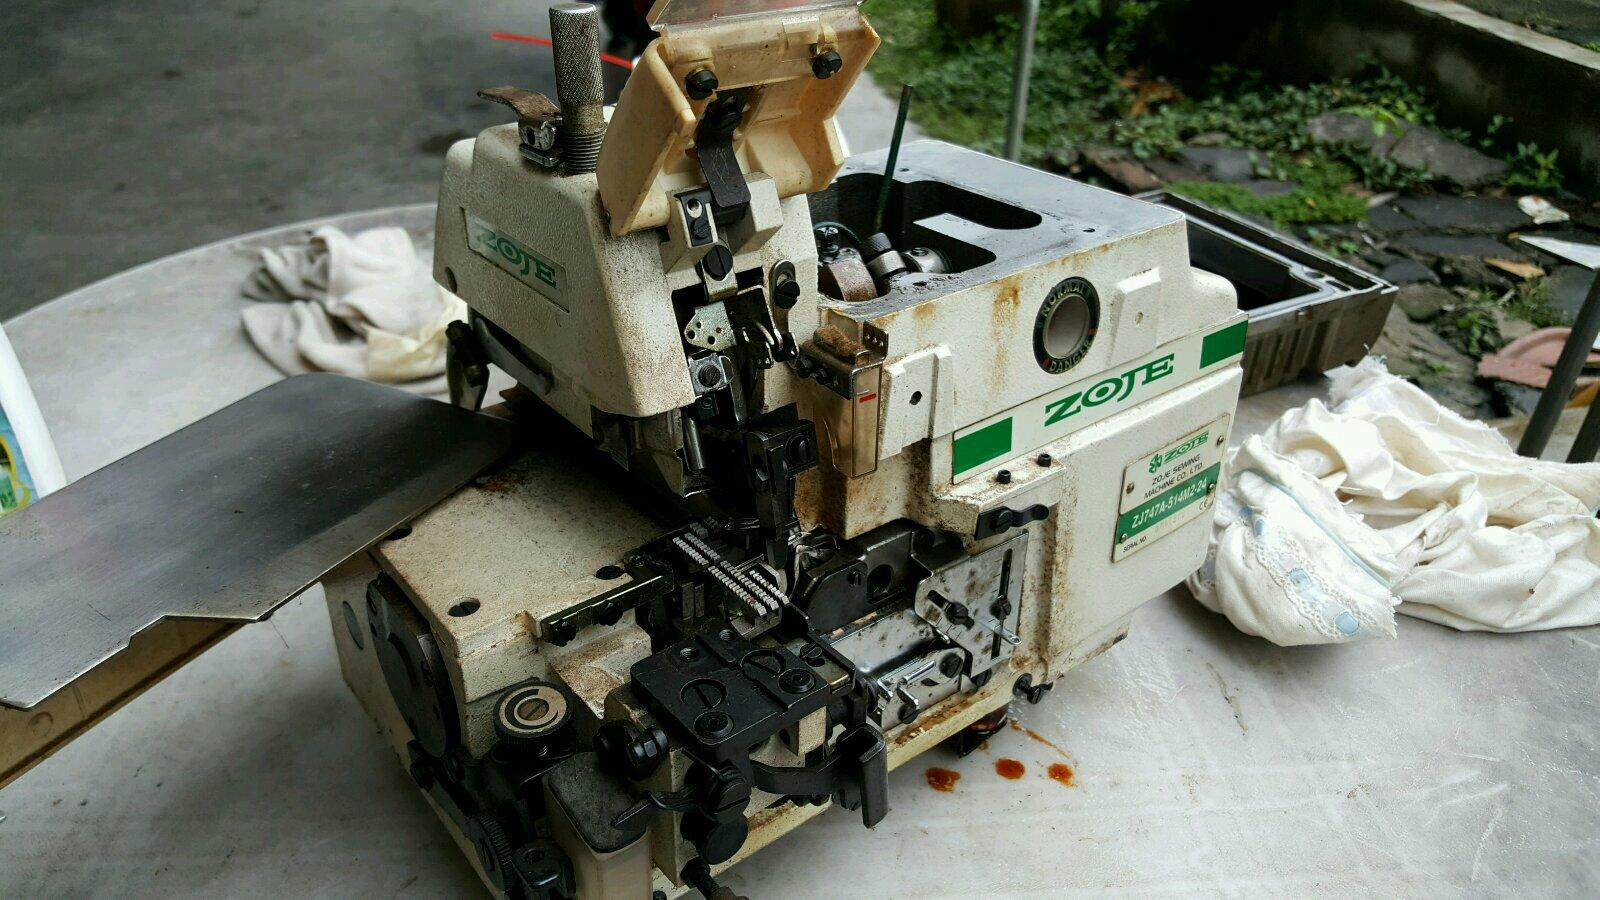 Repai Zoje Overlock Machine At At At At Excel Sewing Machine Centre